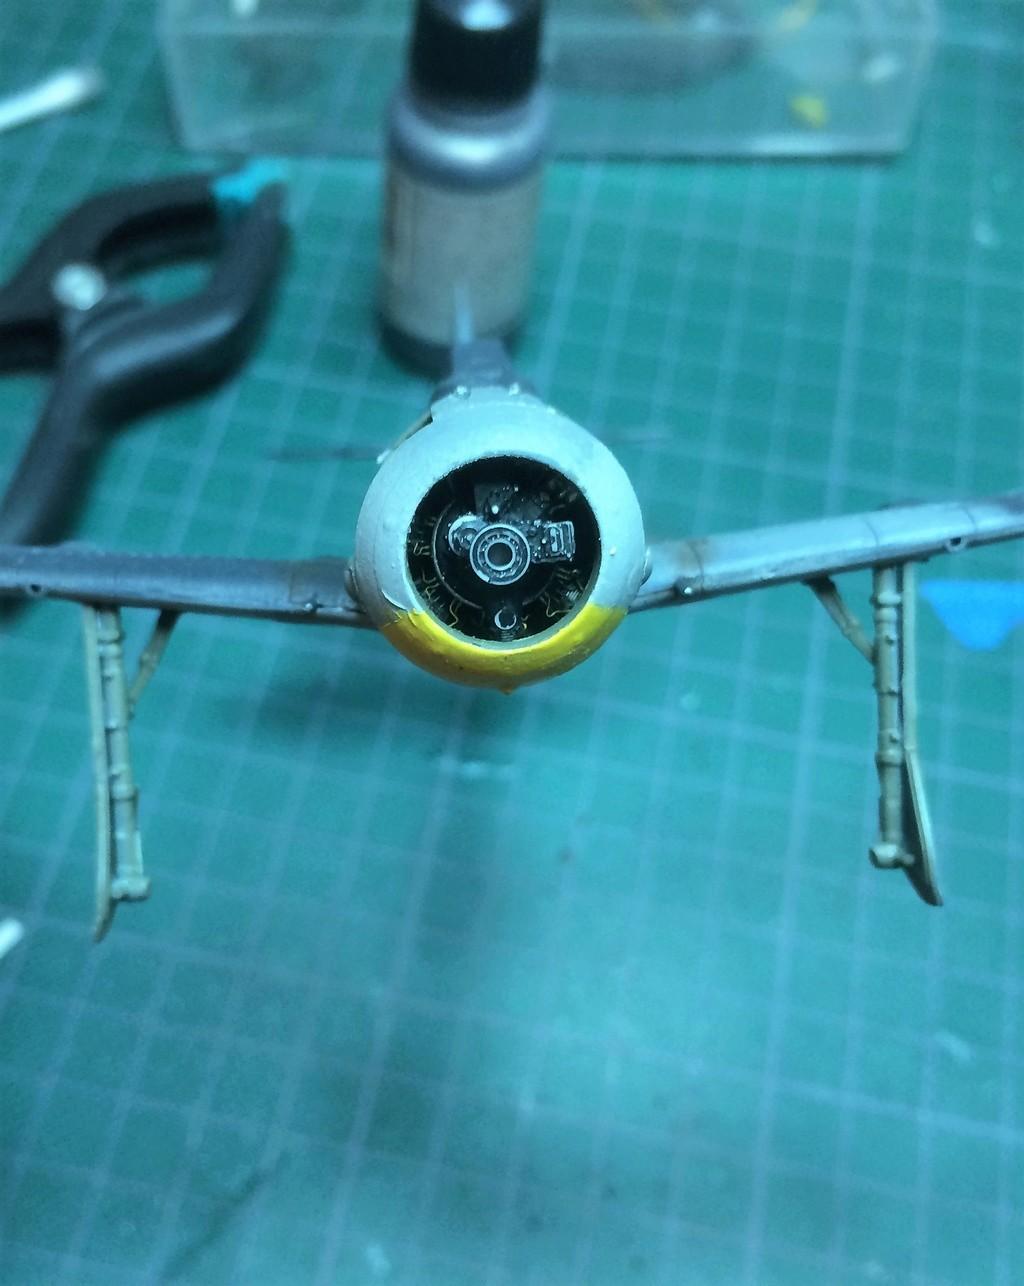 FW 190A8 - EDUARD ROYAL CLASS + Brassin -1/72 + projet diorama (Trois avions terminés) - Page 2 Img_7423